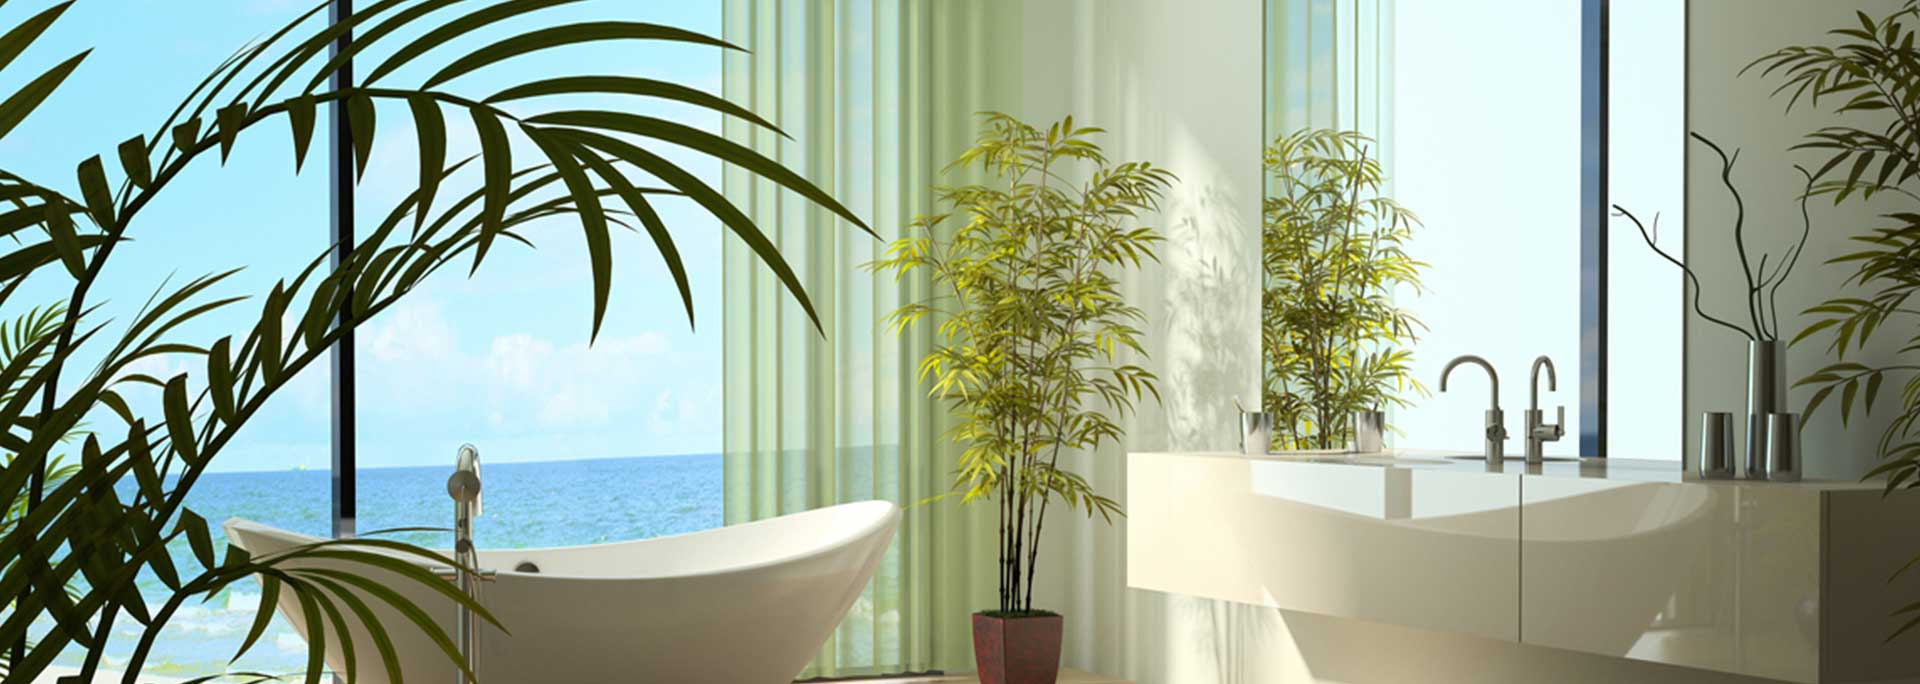 immobilier frontignan action immobilier 34 vente balaruc les bains et environs. Black Bedroom Furniture Sets. Home Design Ideas